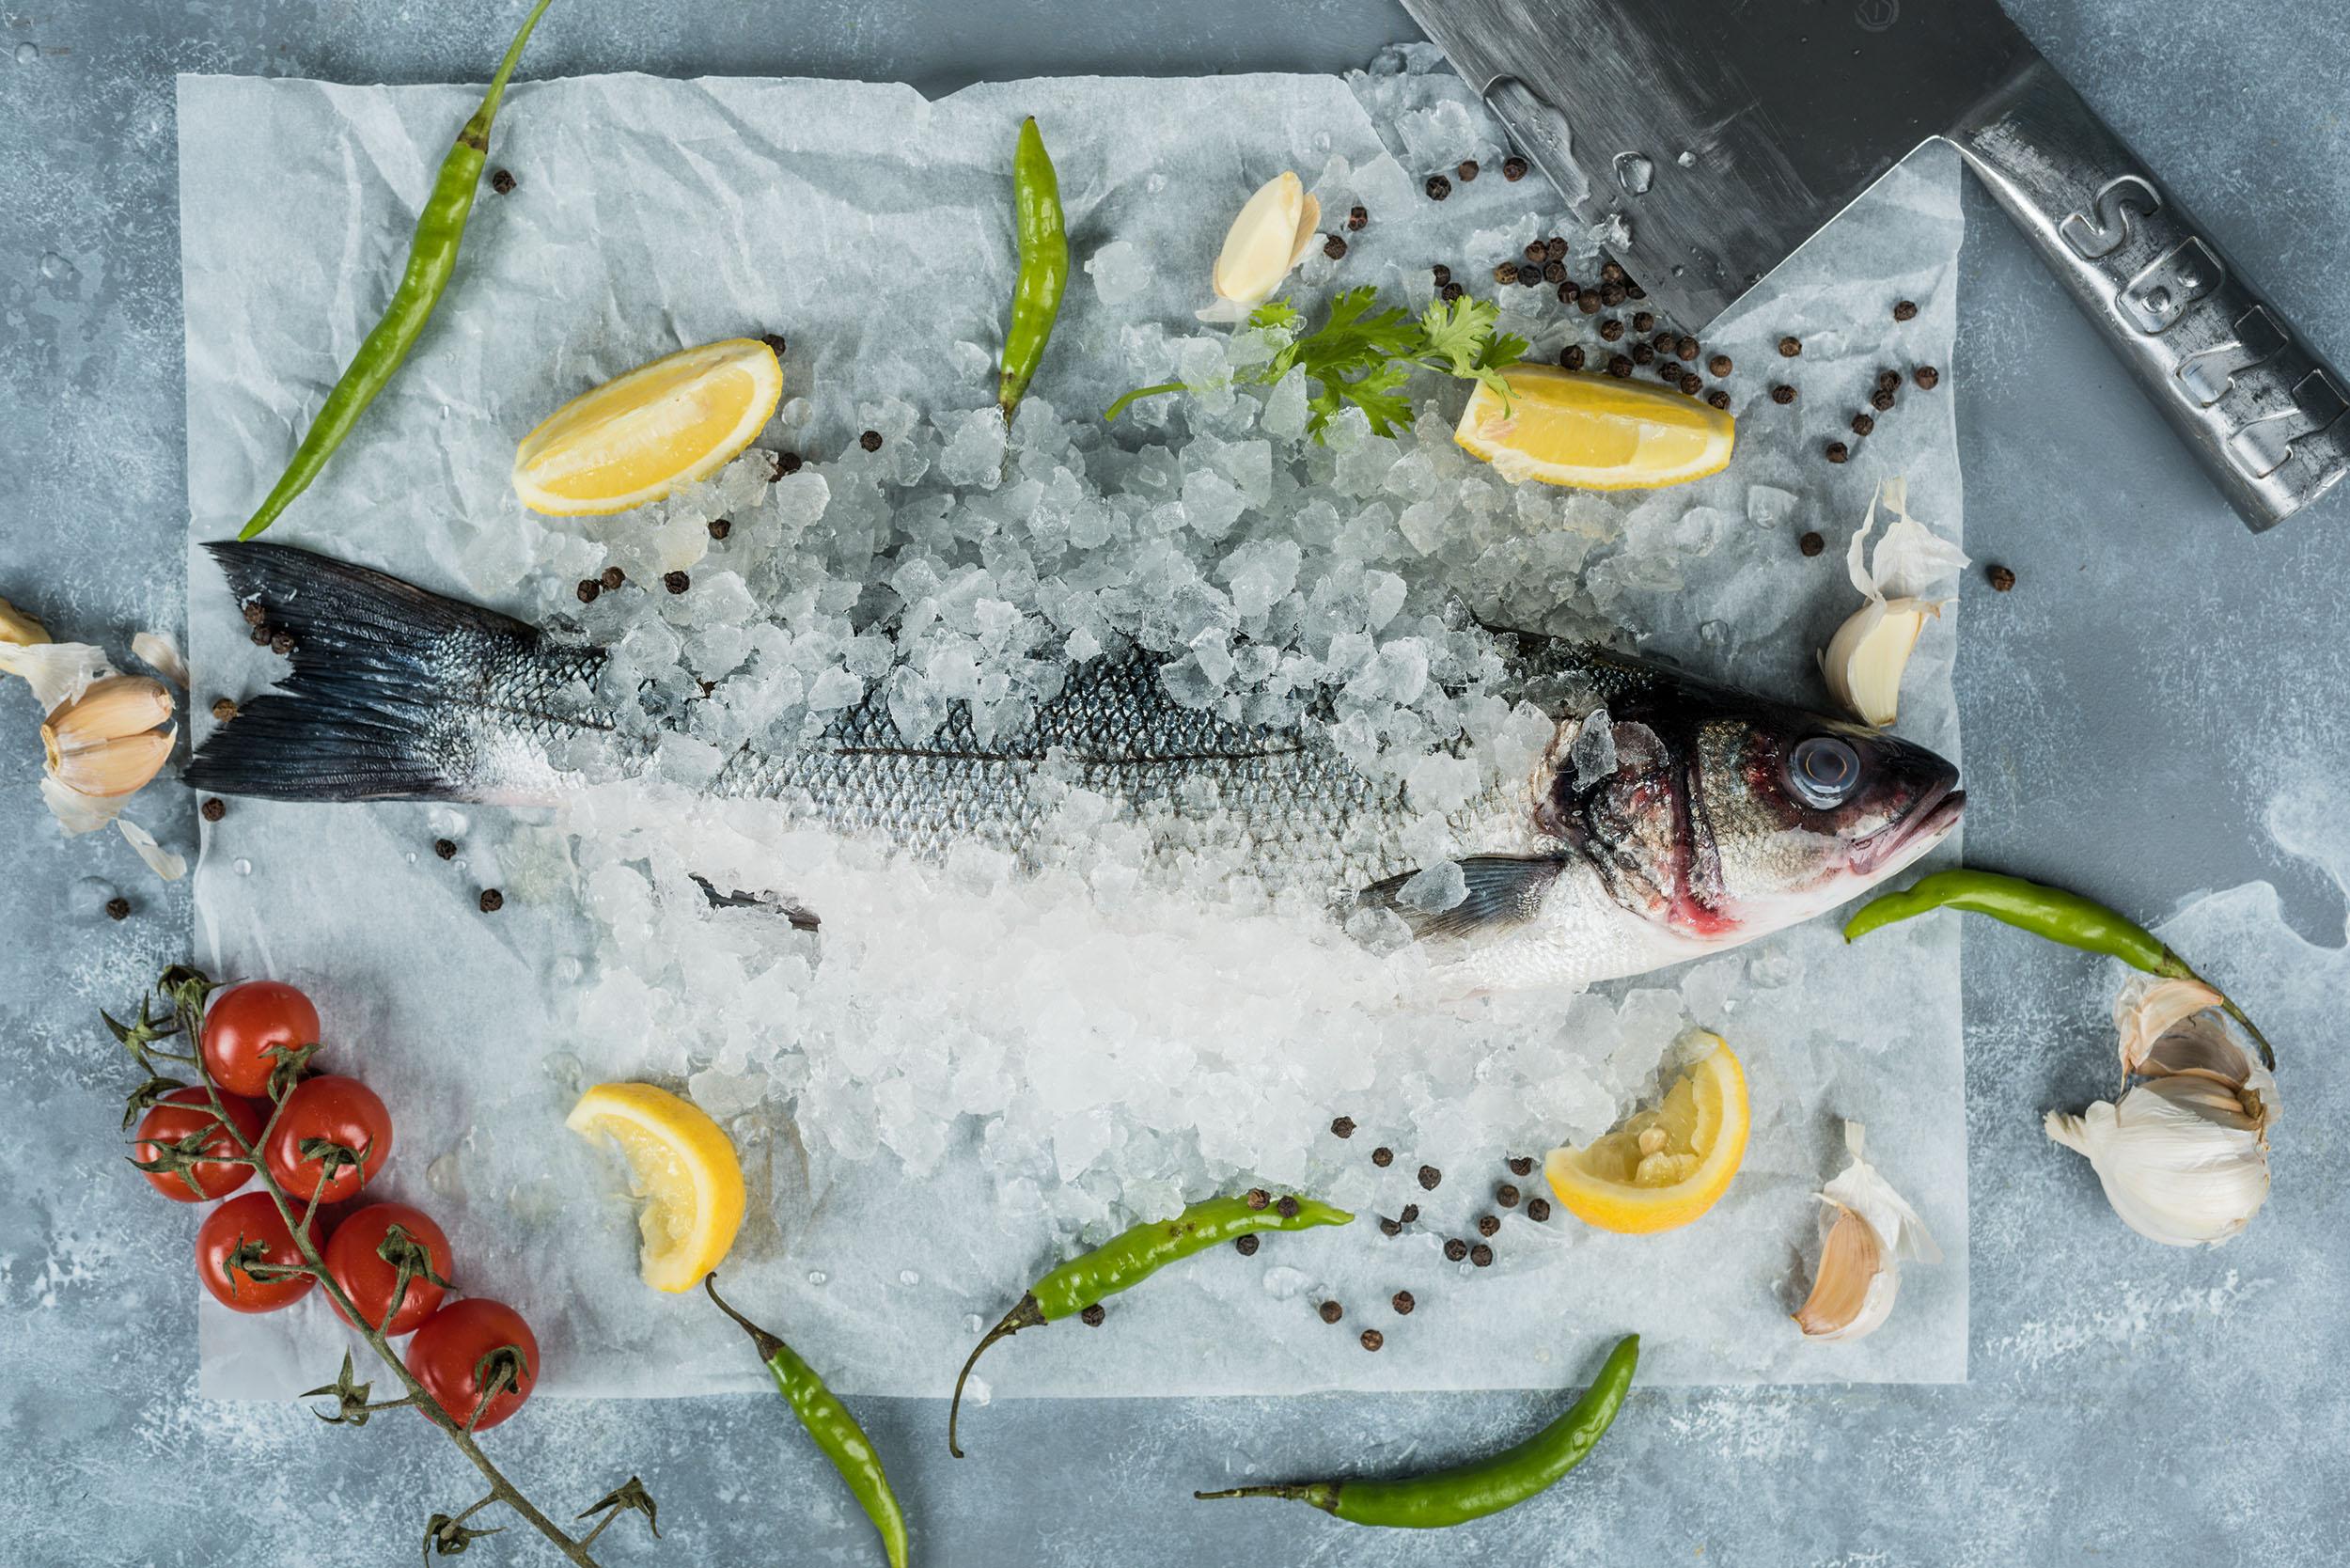 Seafoodmarket-8046.jpg